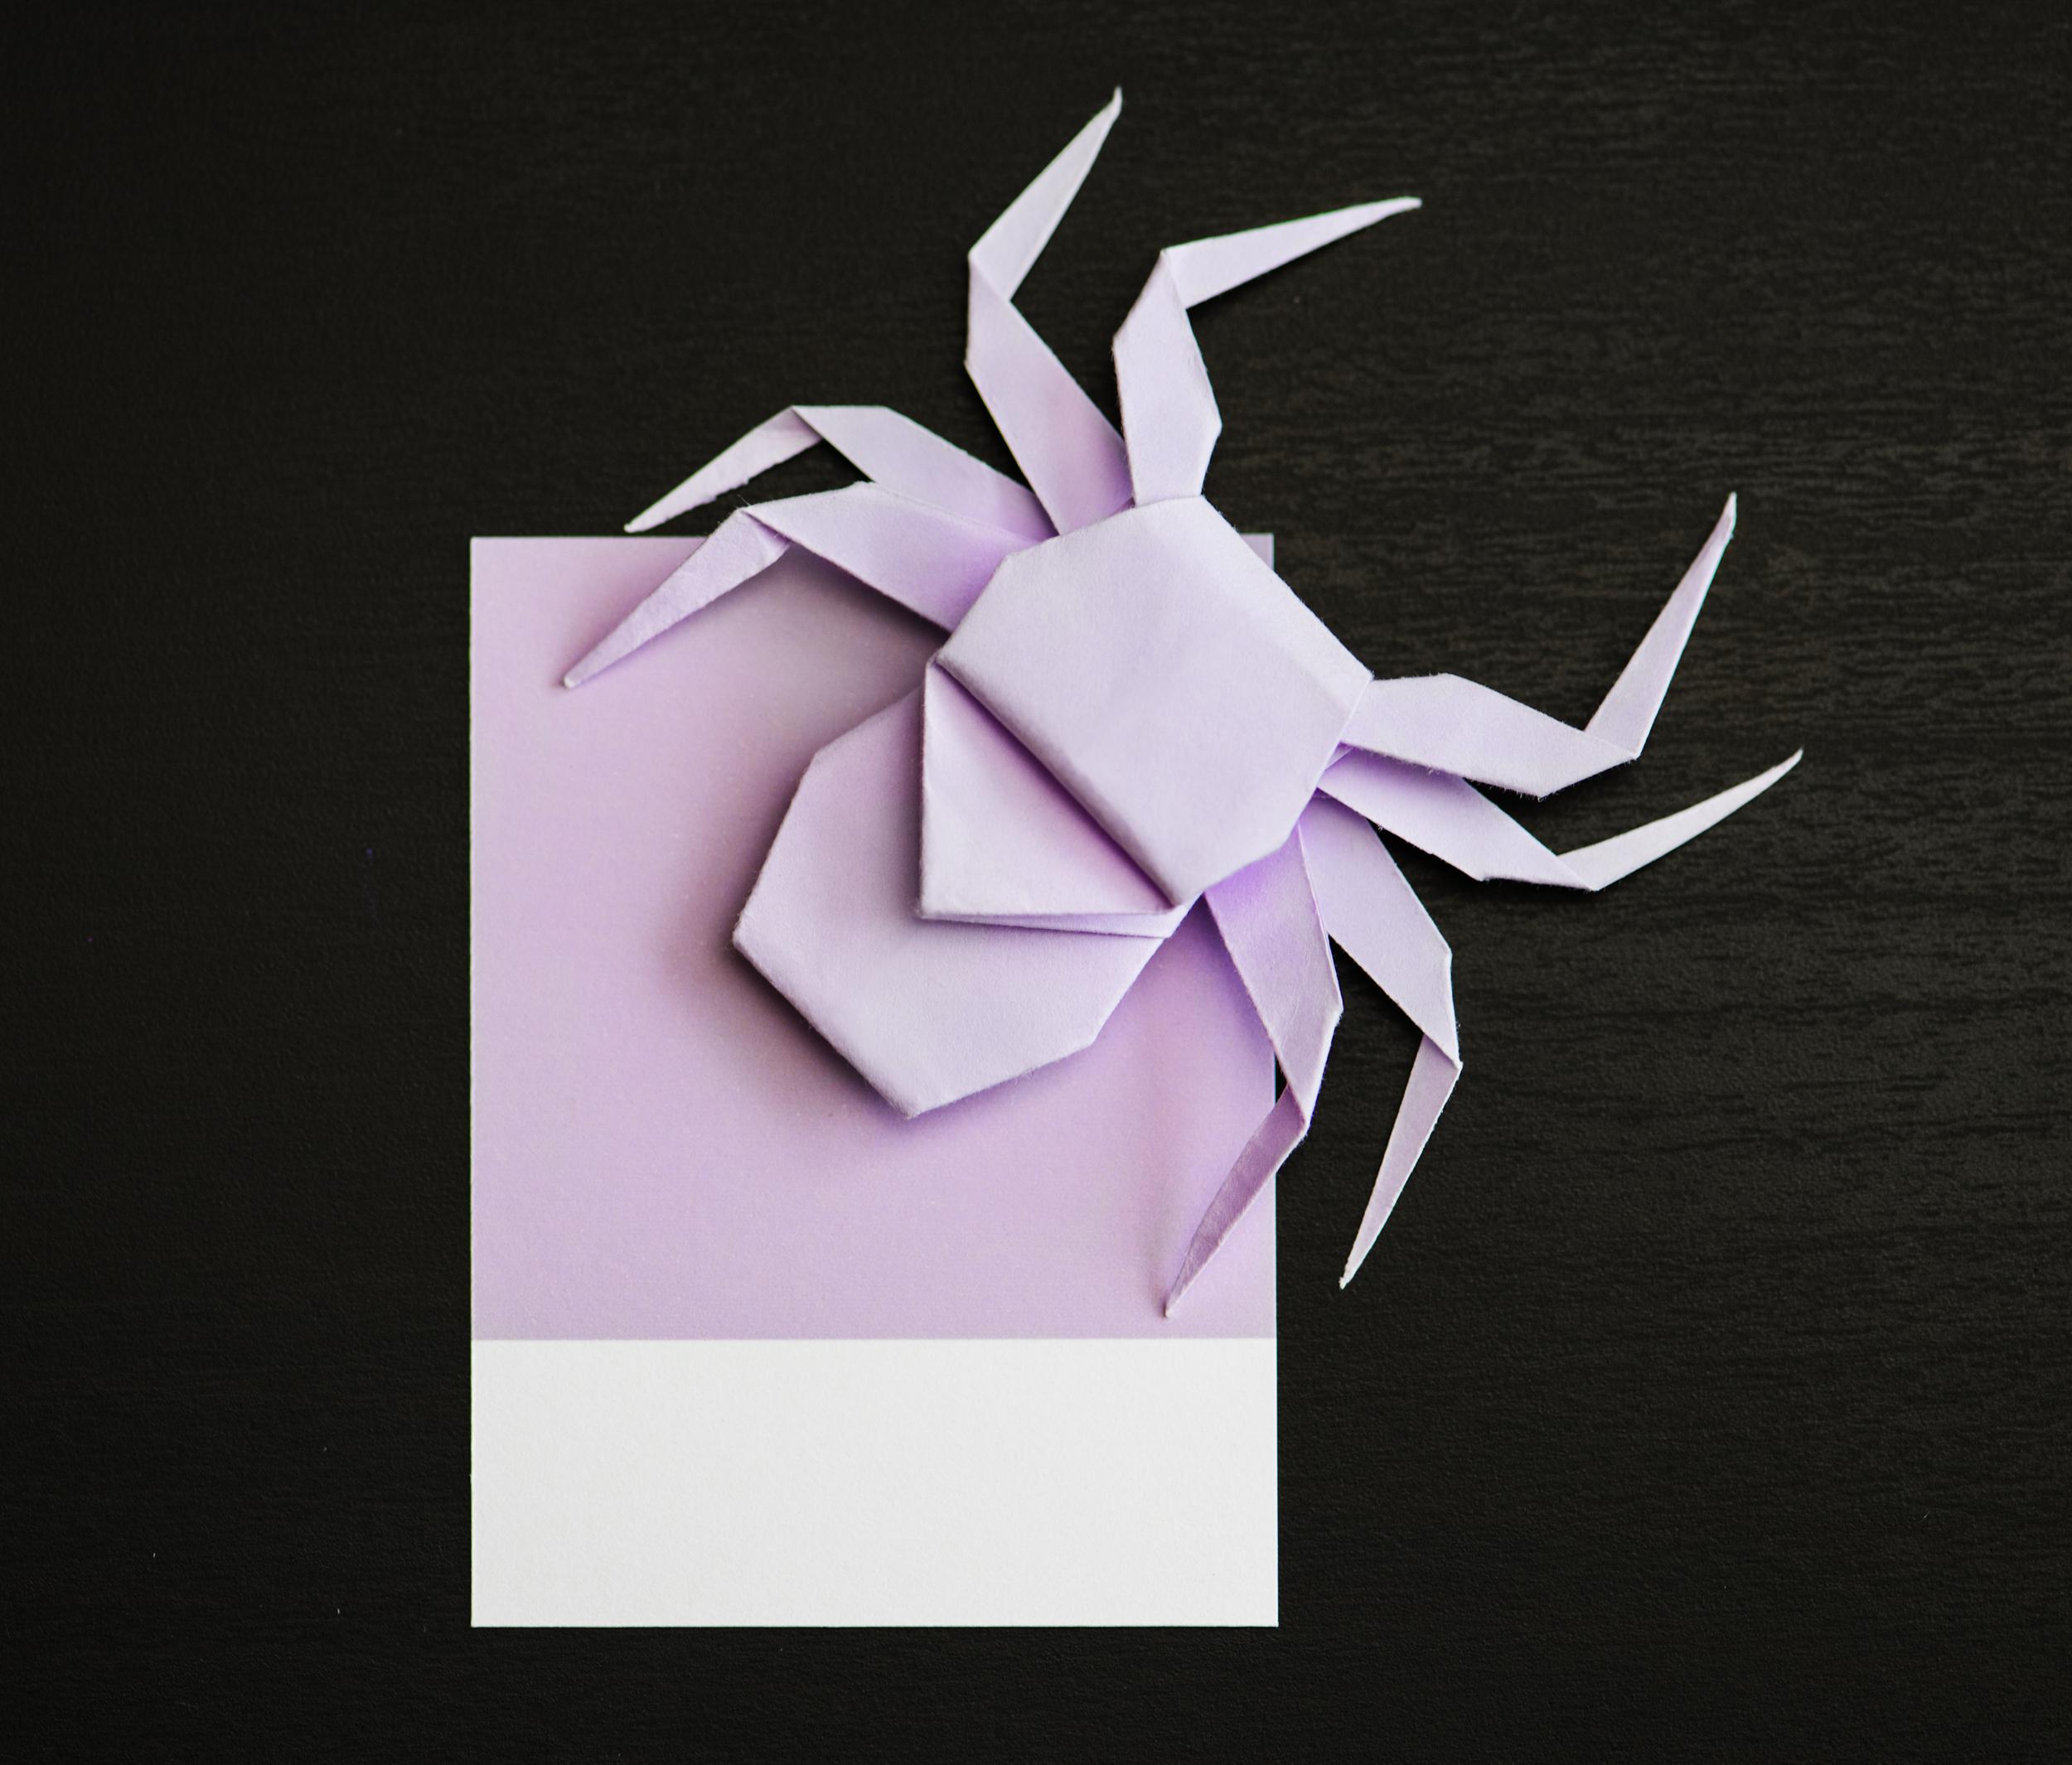 Animal Art Background Black Bright Bug Card Close Up Colorful Craft Creativity Decoration Decorative Design Folded